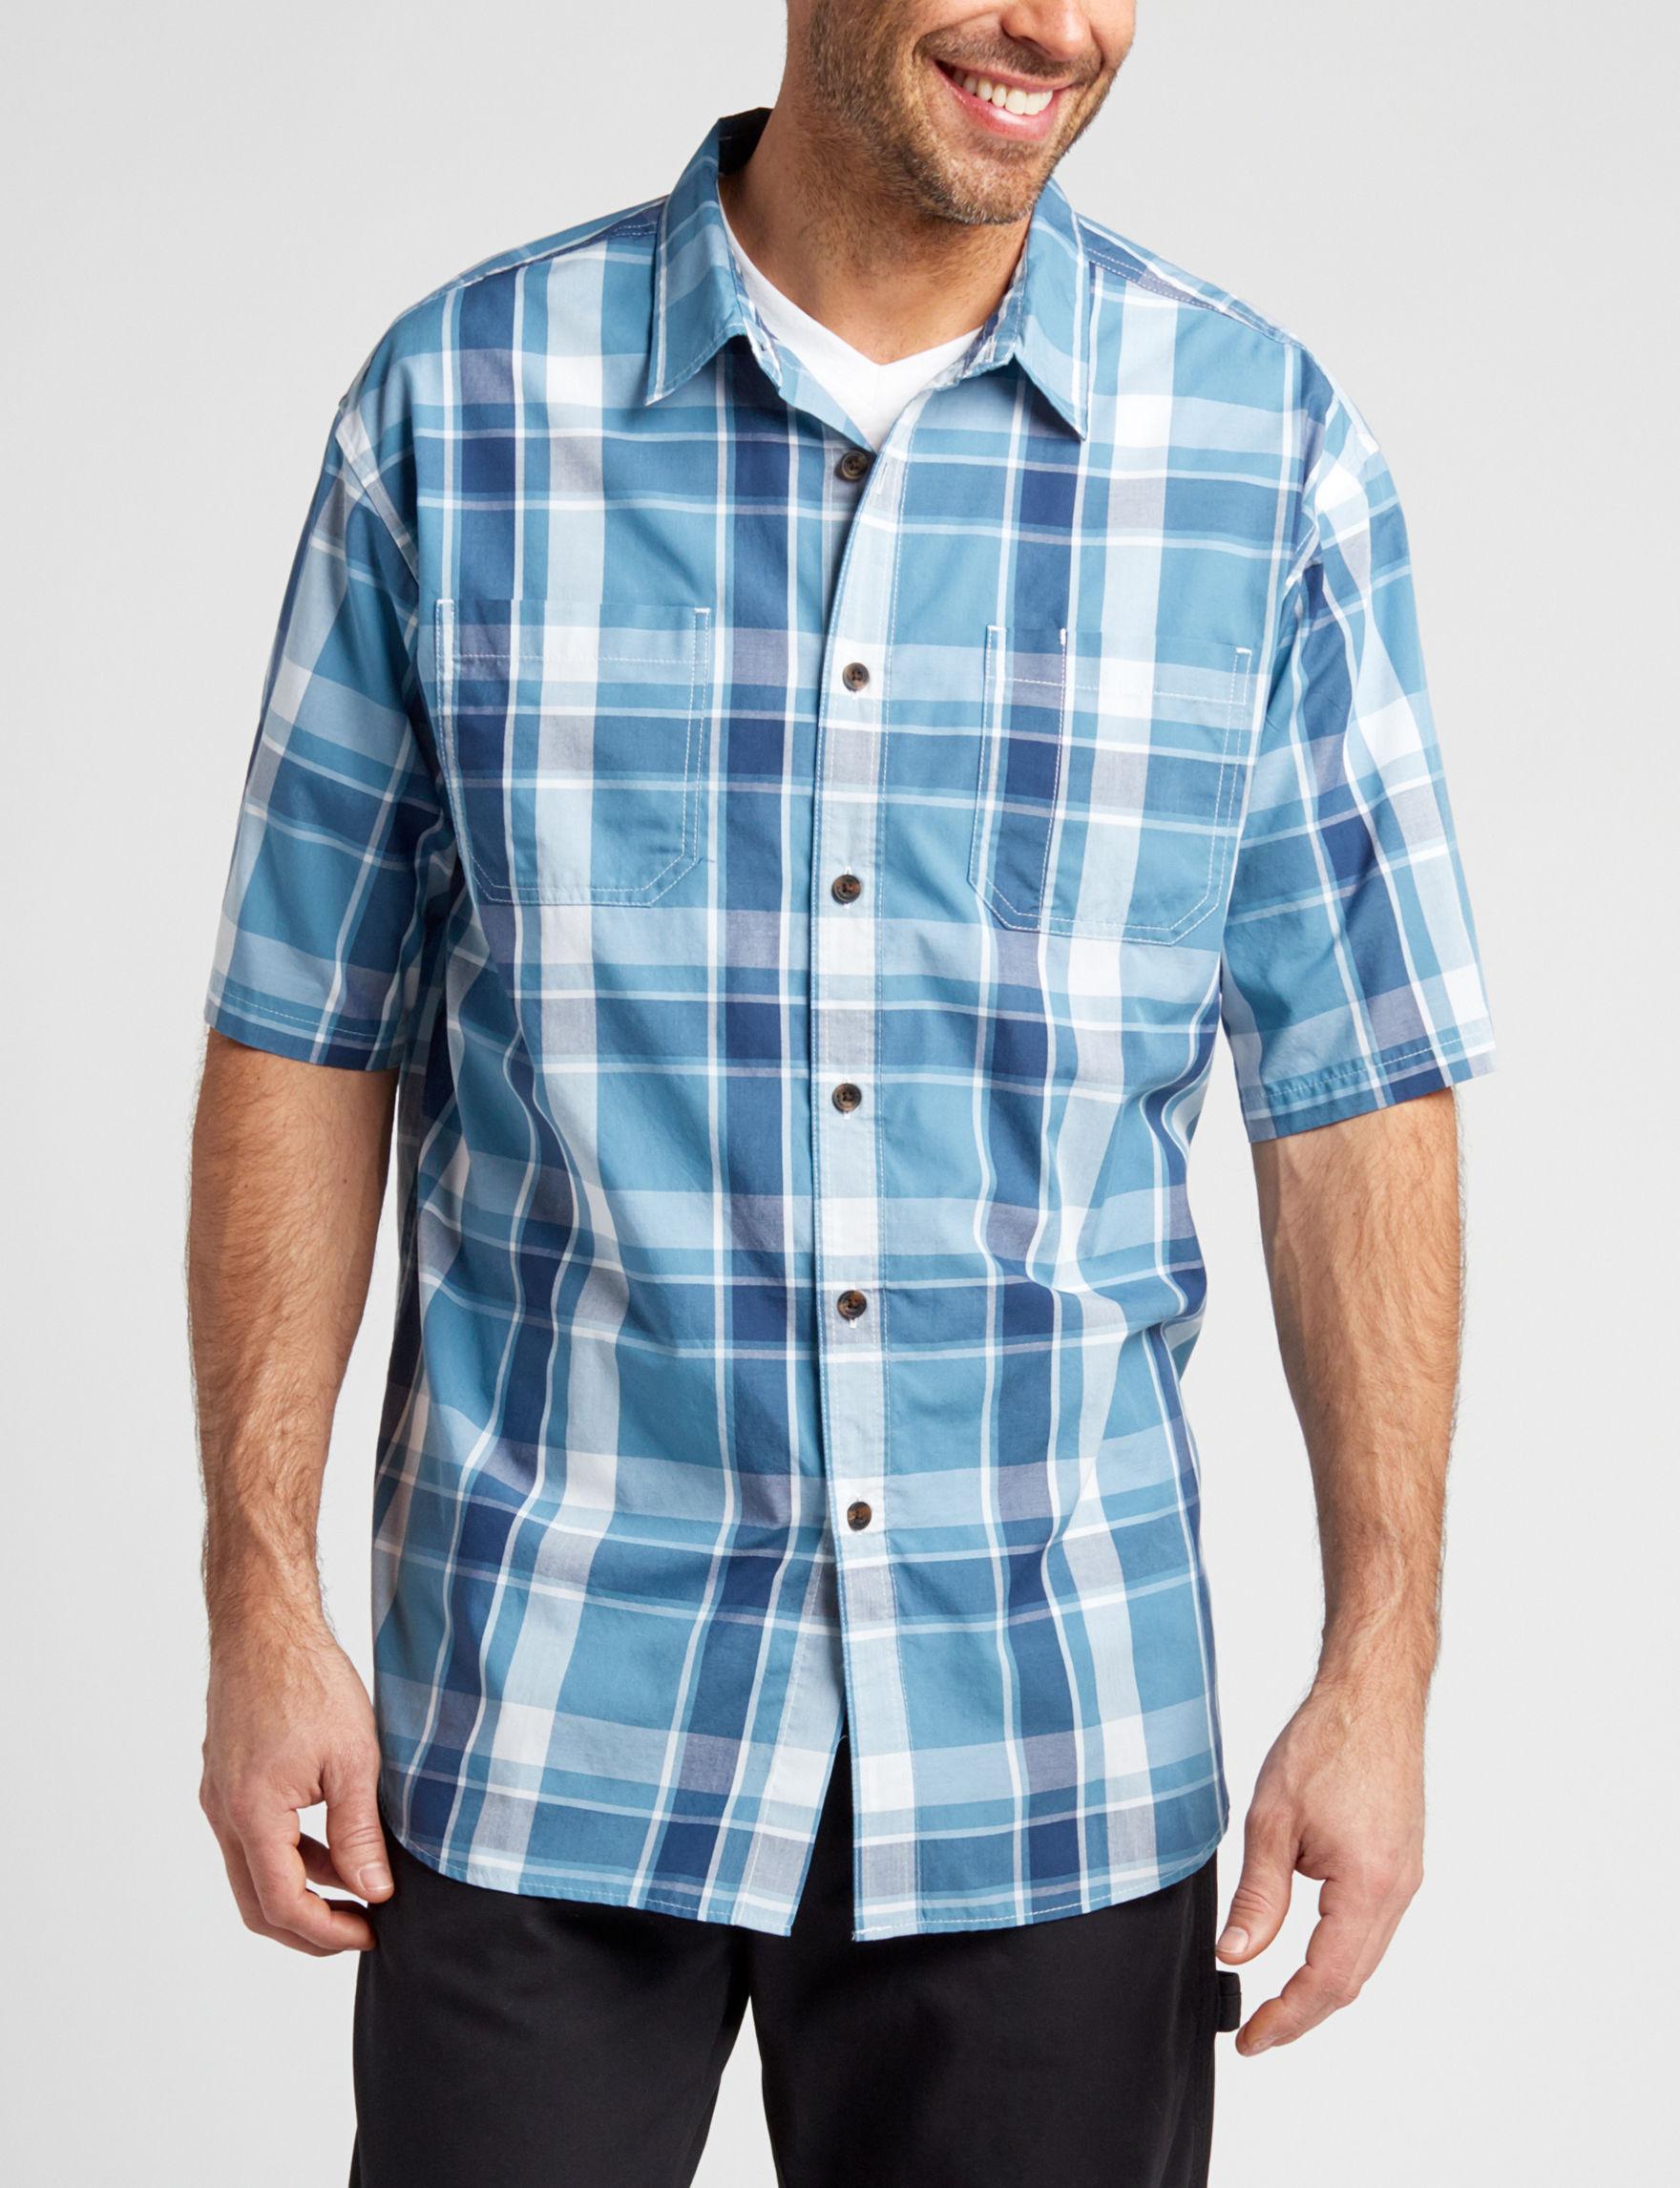 Dickies Blue Plaid Casual Button Down Shirts